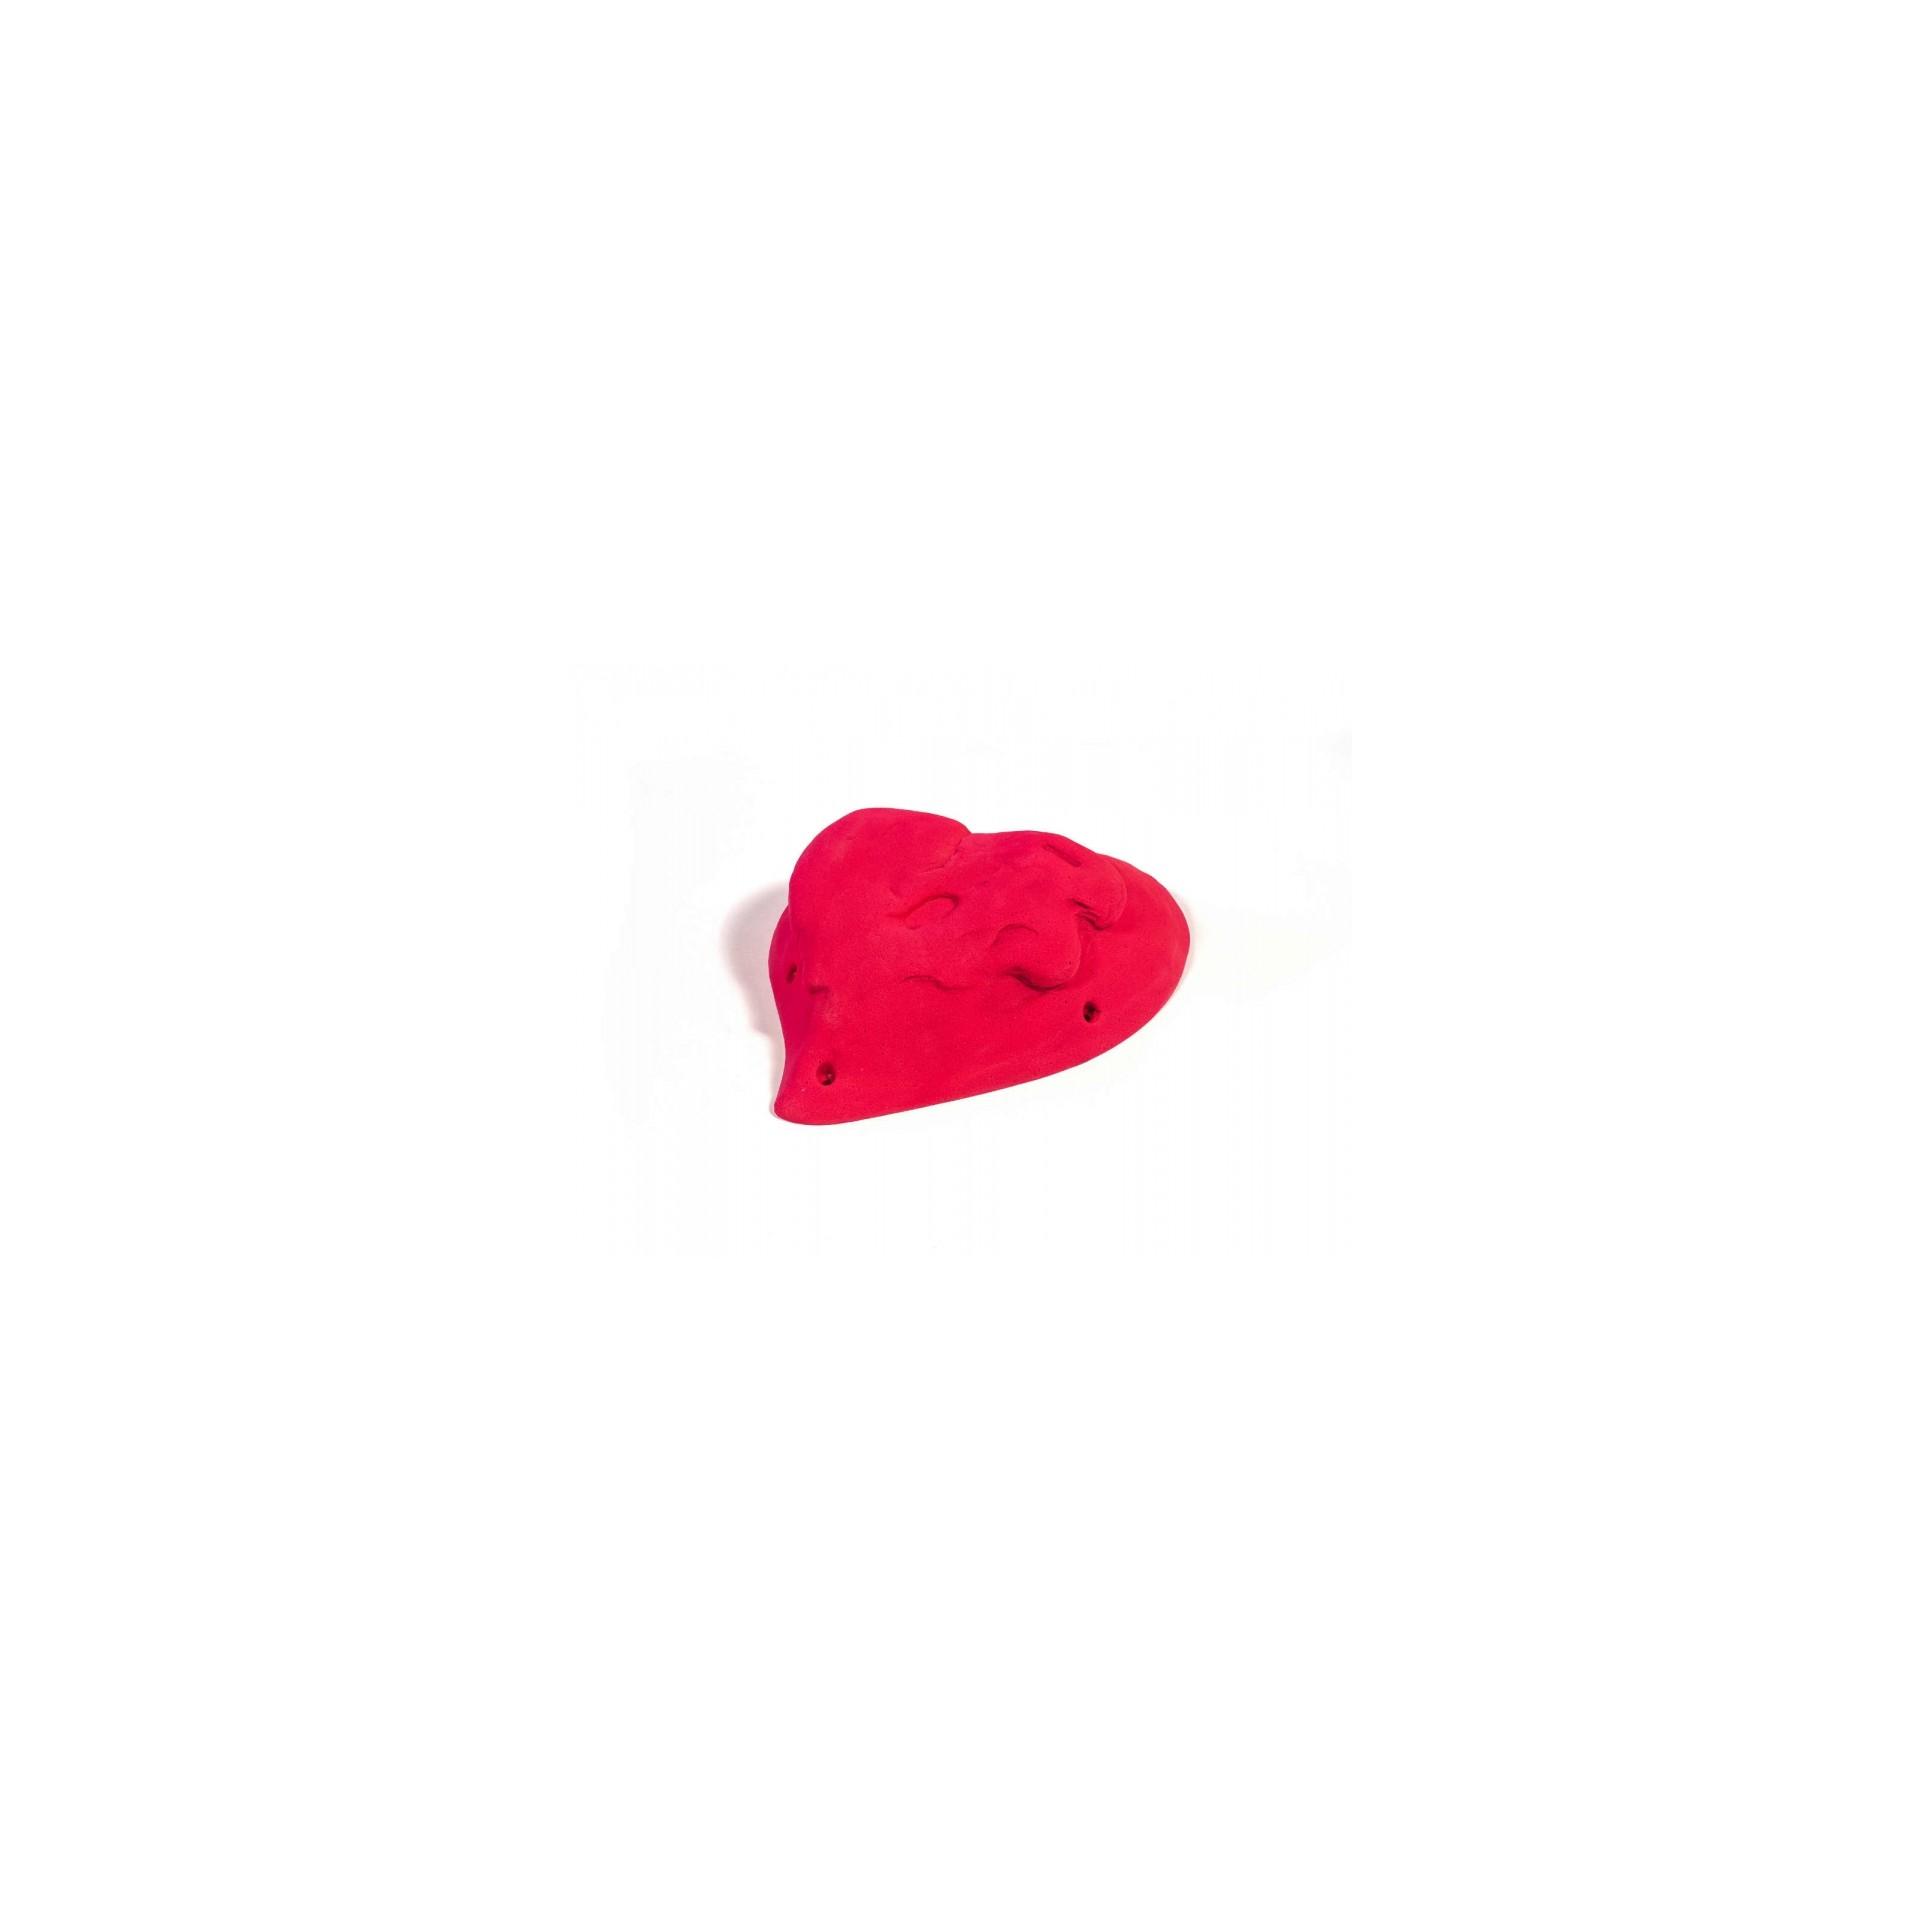 Le Coeur - Holds.fr